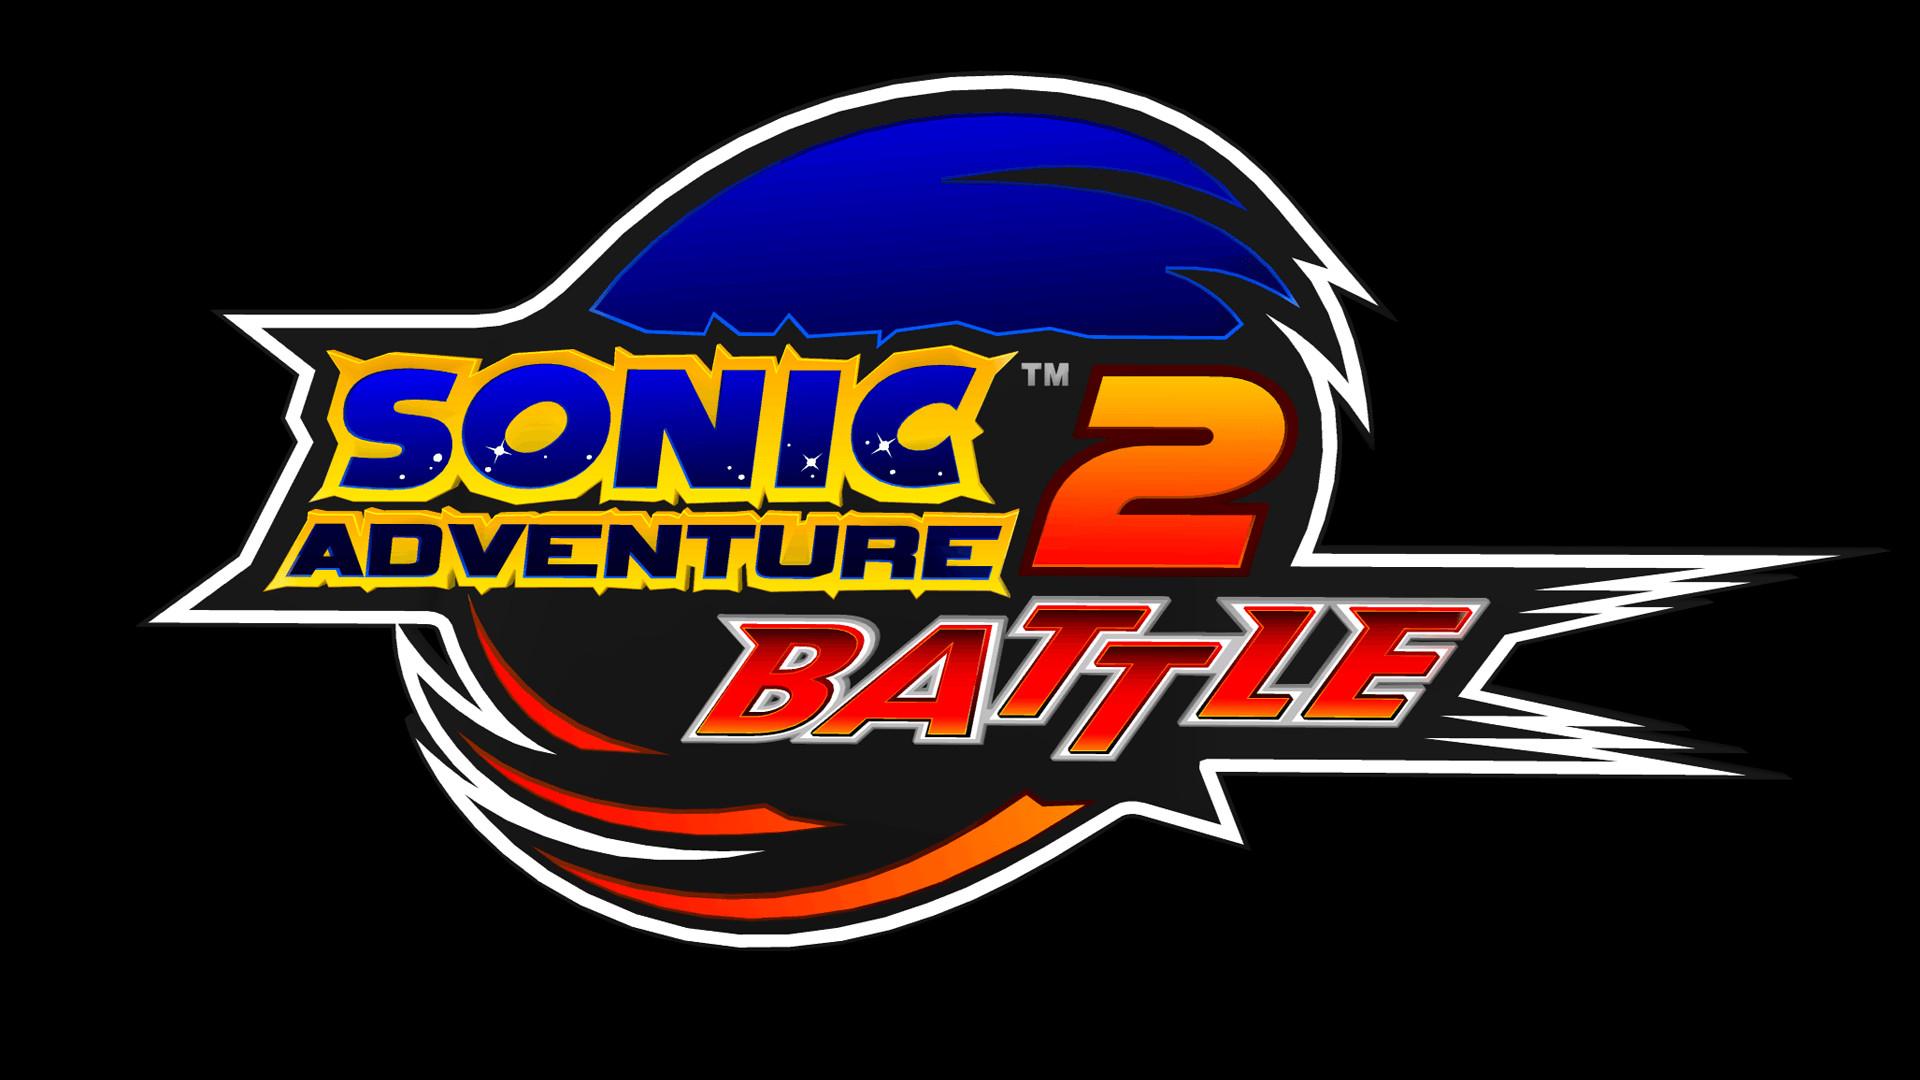 Sonic Adventure 2 Battle Wallpaper Wallpapertag